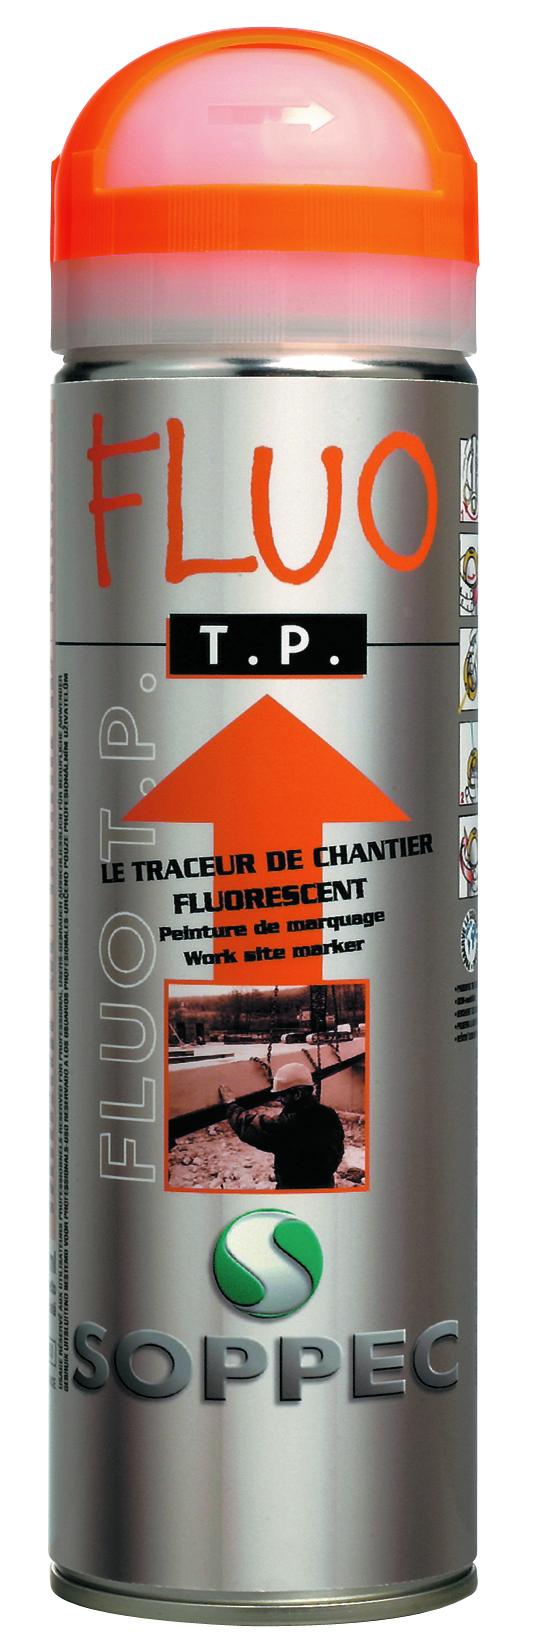 Soppec Fluo TP markeerverf in spuitbus-0